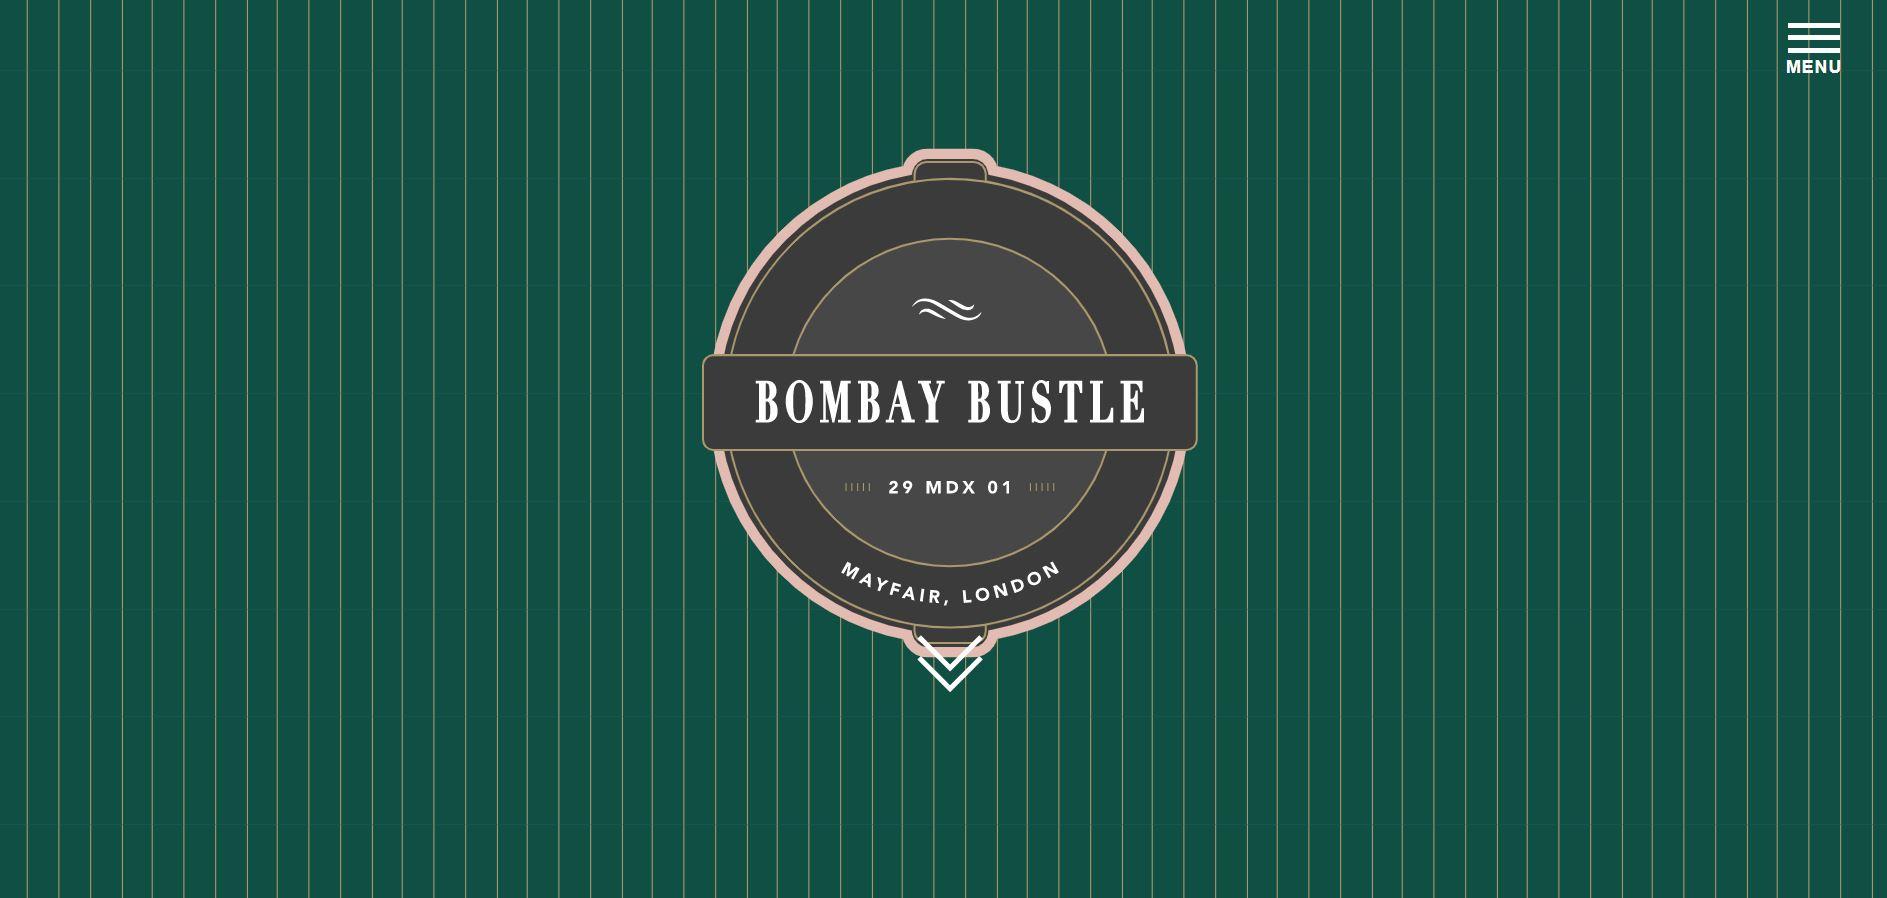 Bombay bustle